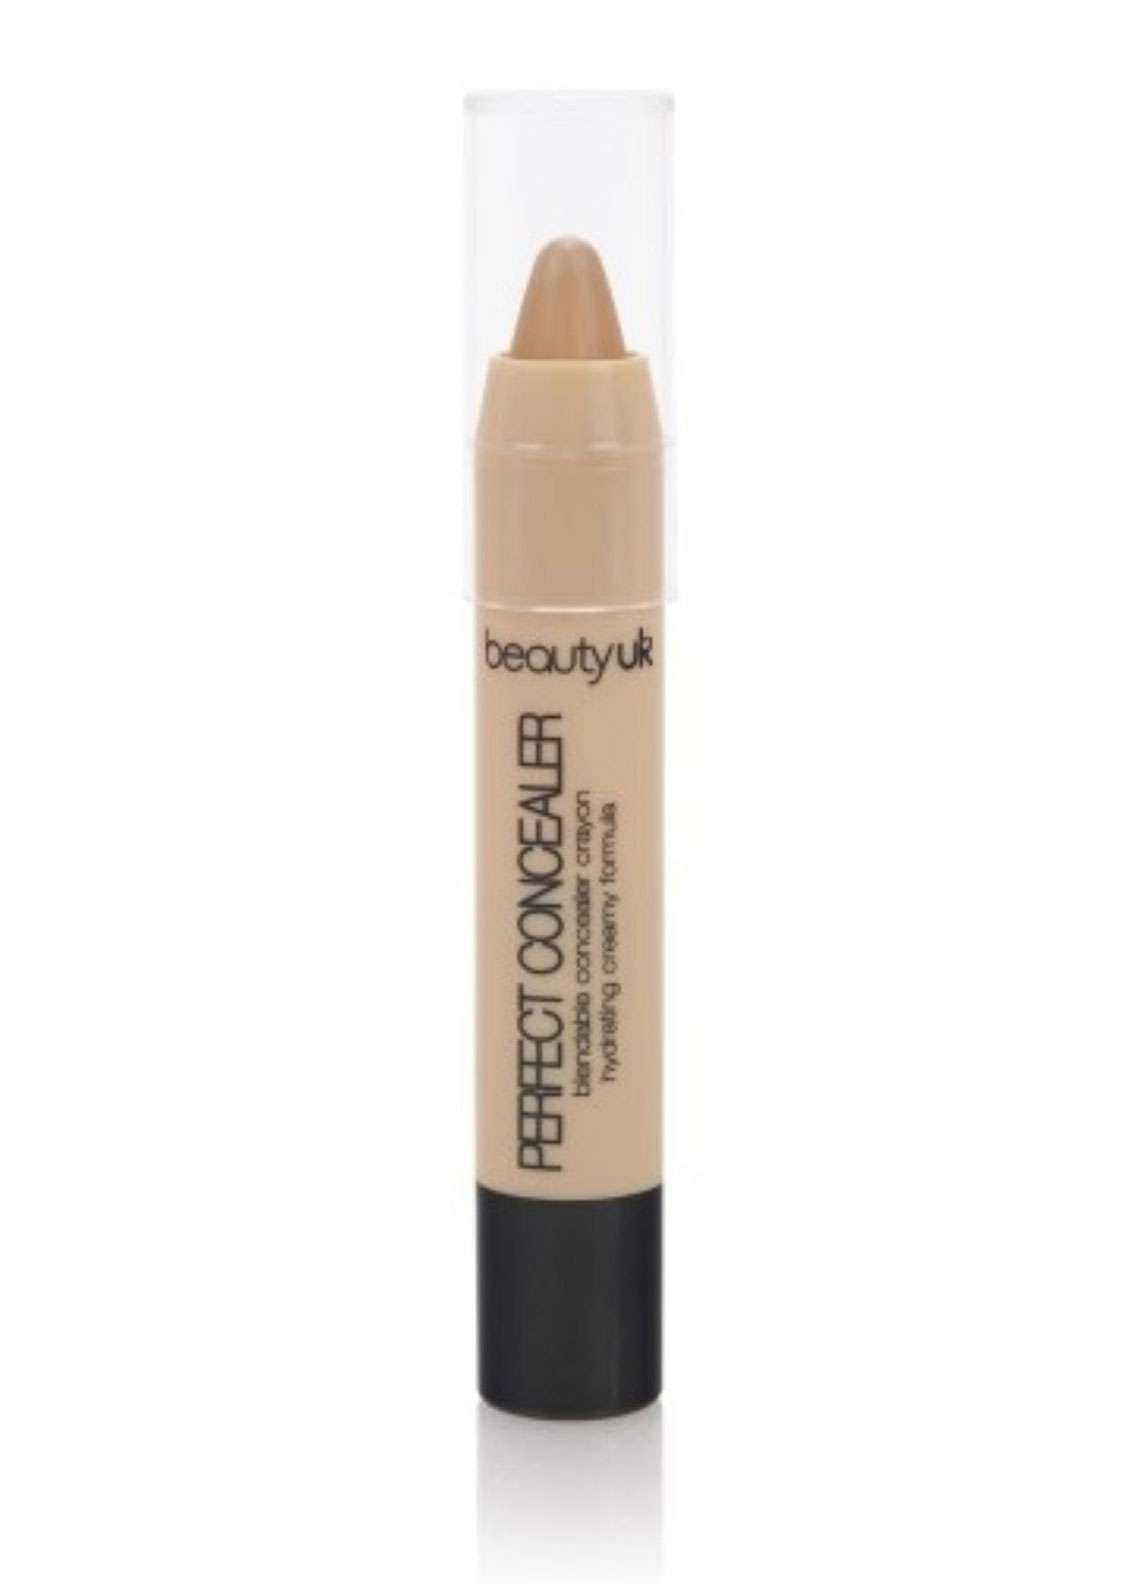 Beauty UK Perfect Concealer Crayon - 3 Medium Dark